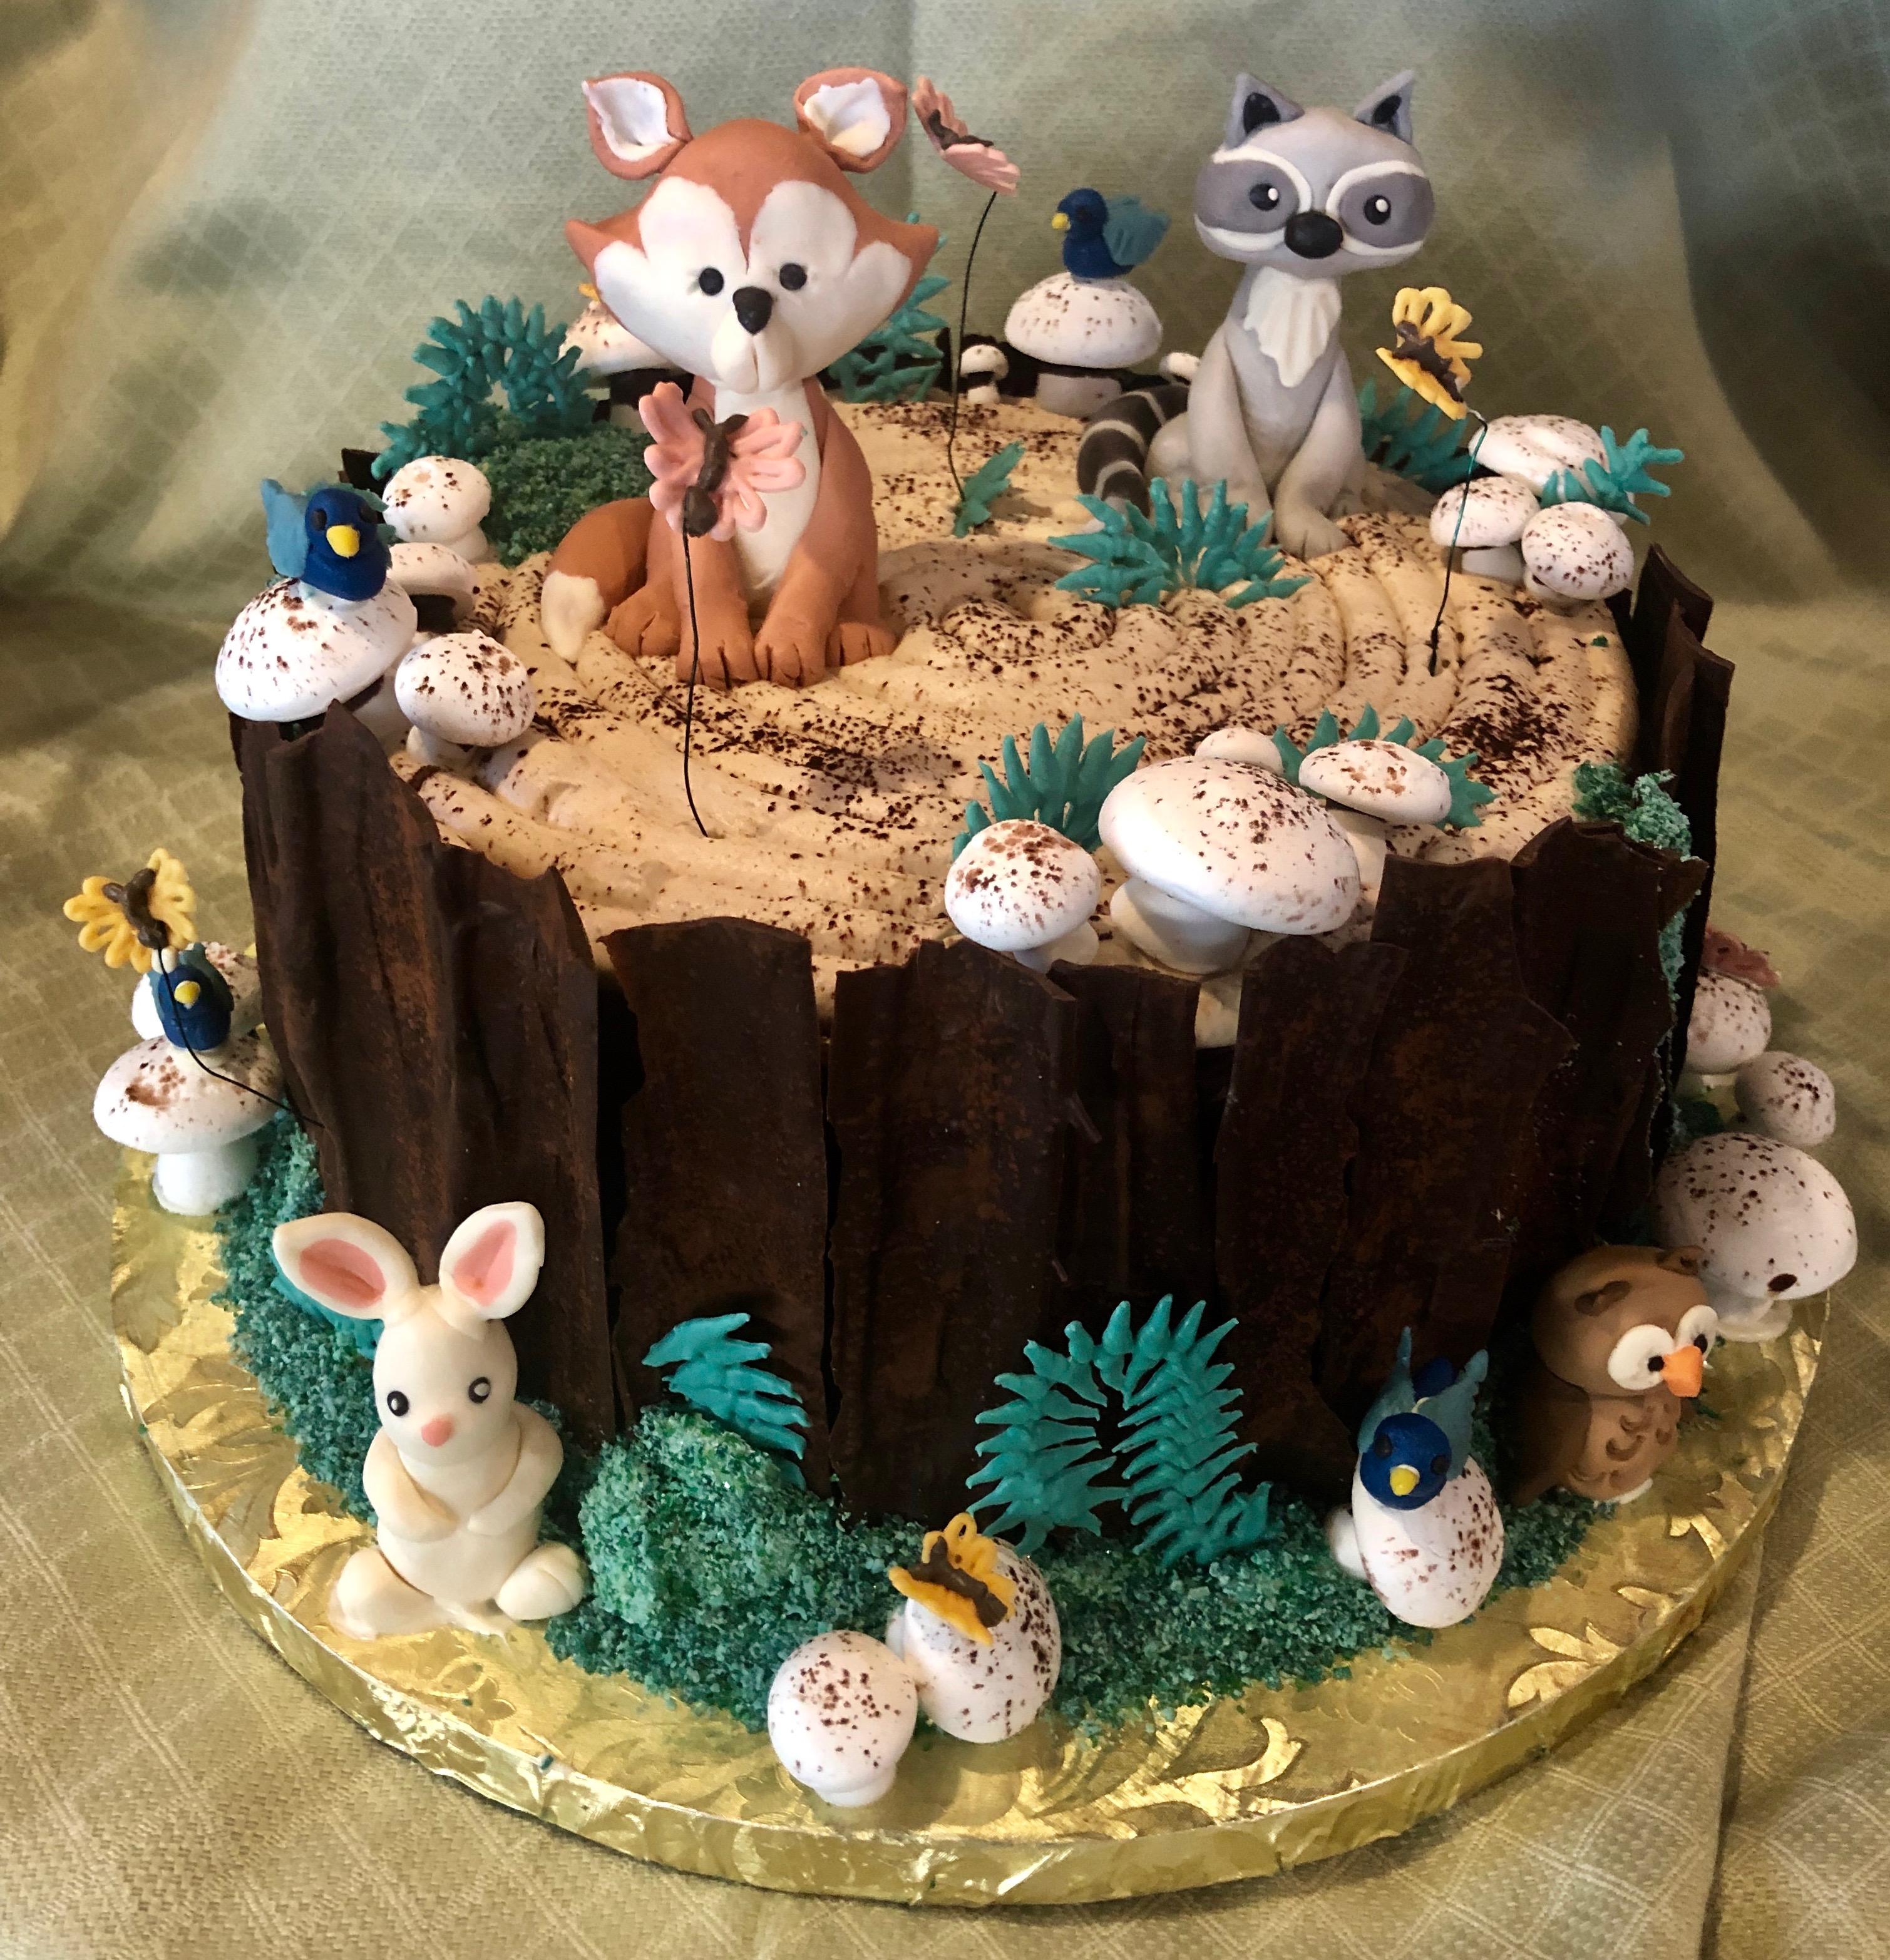 Centrum Gala cake 2019